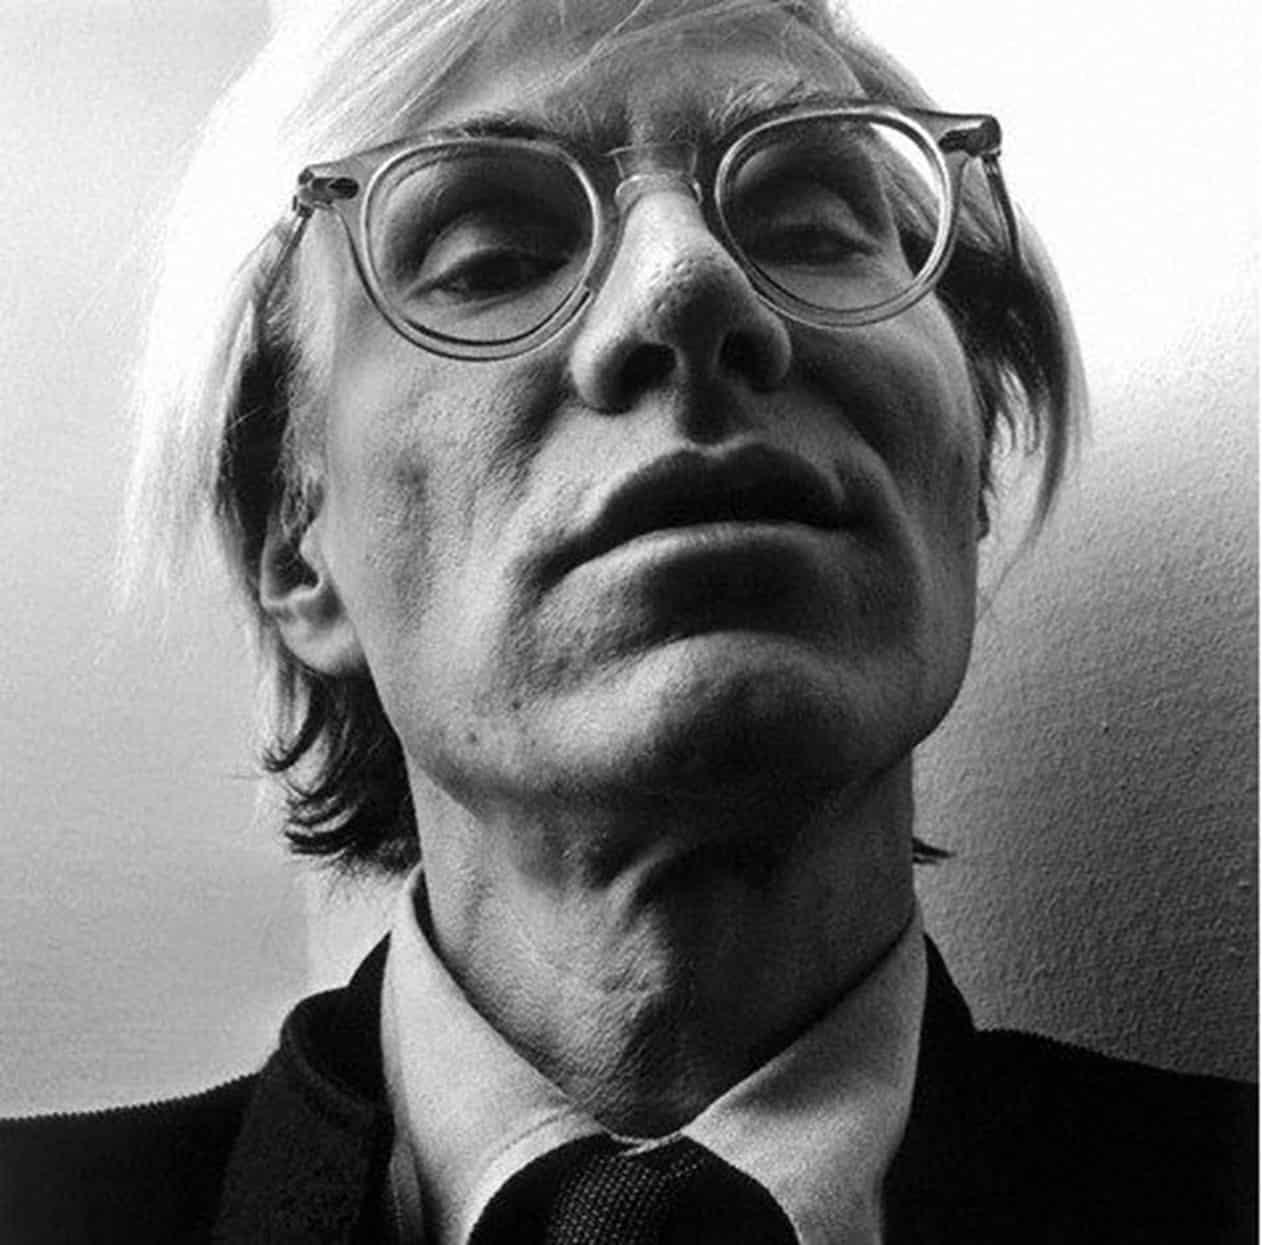 Andy Warhol Wig, Manhattan auction